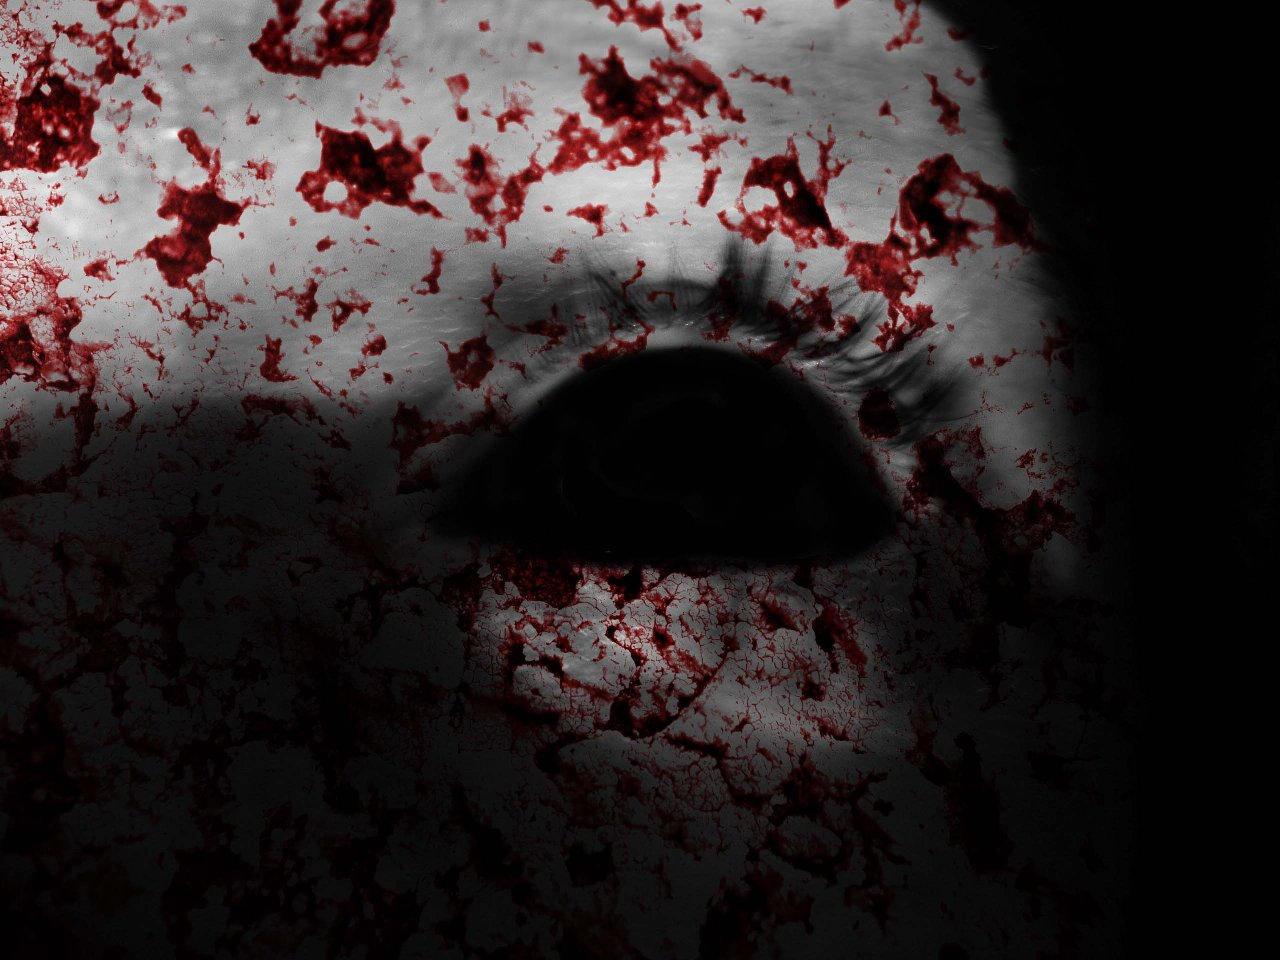 Bloodshot1 by alexisw